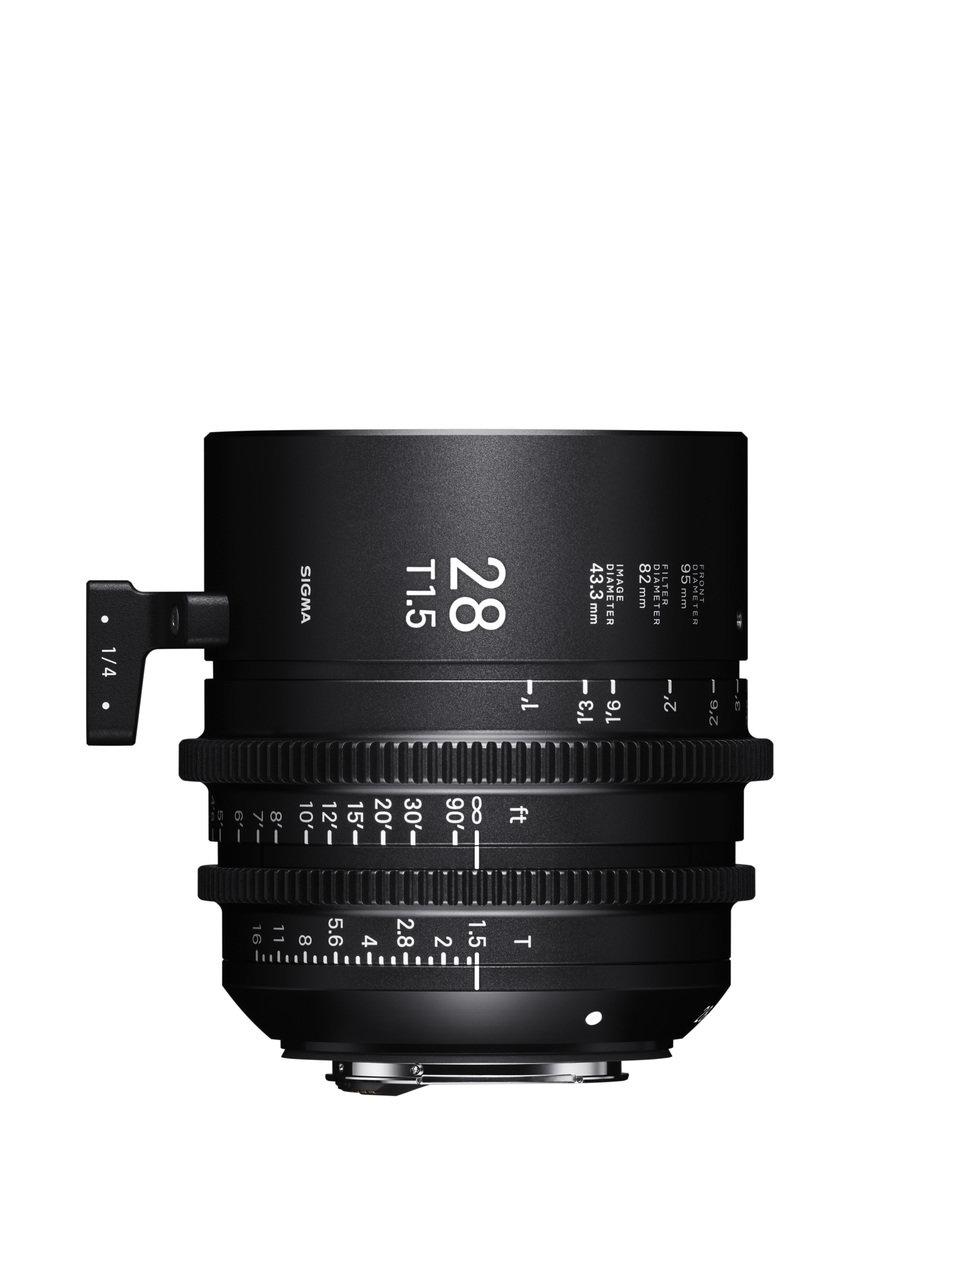 SIGMA 28mm T1.5 FF